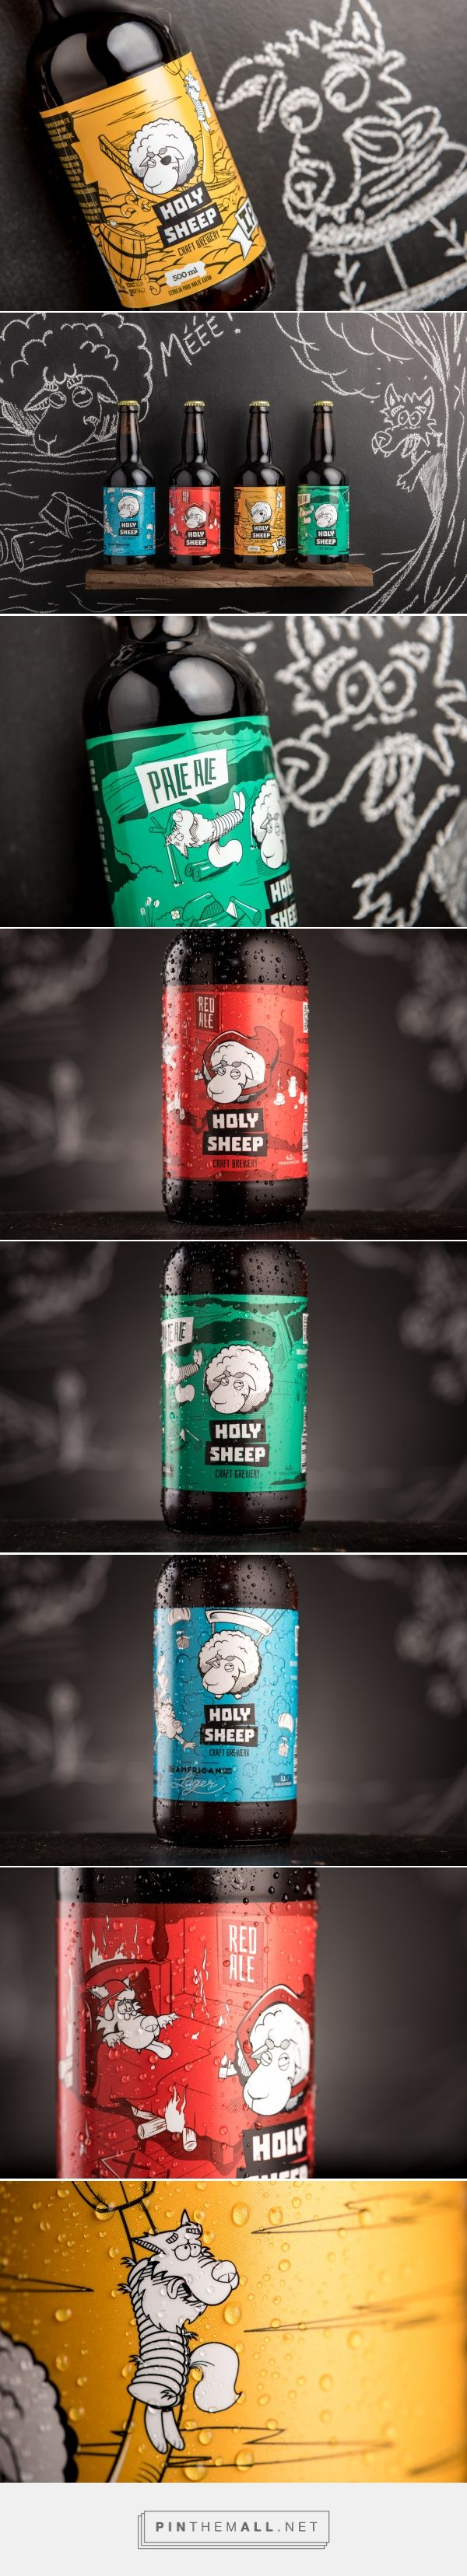 Holy Sheeeeeep! Craft Beer #abel design by Empório Adamantis - http://www.packagingoftheworld.com/2016/10/holy-sheeeeeep.html